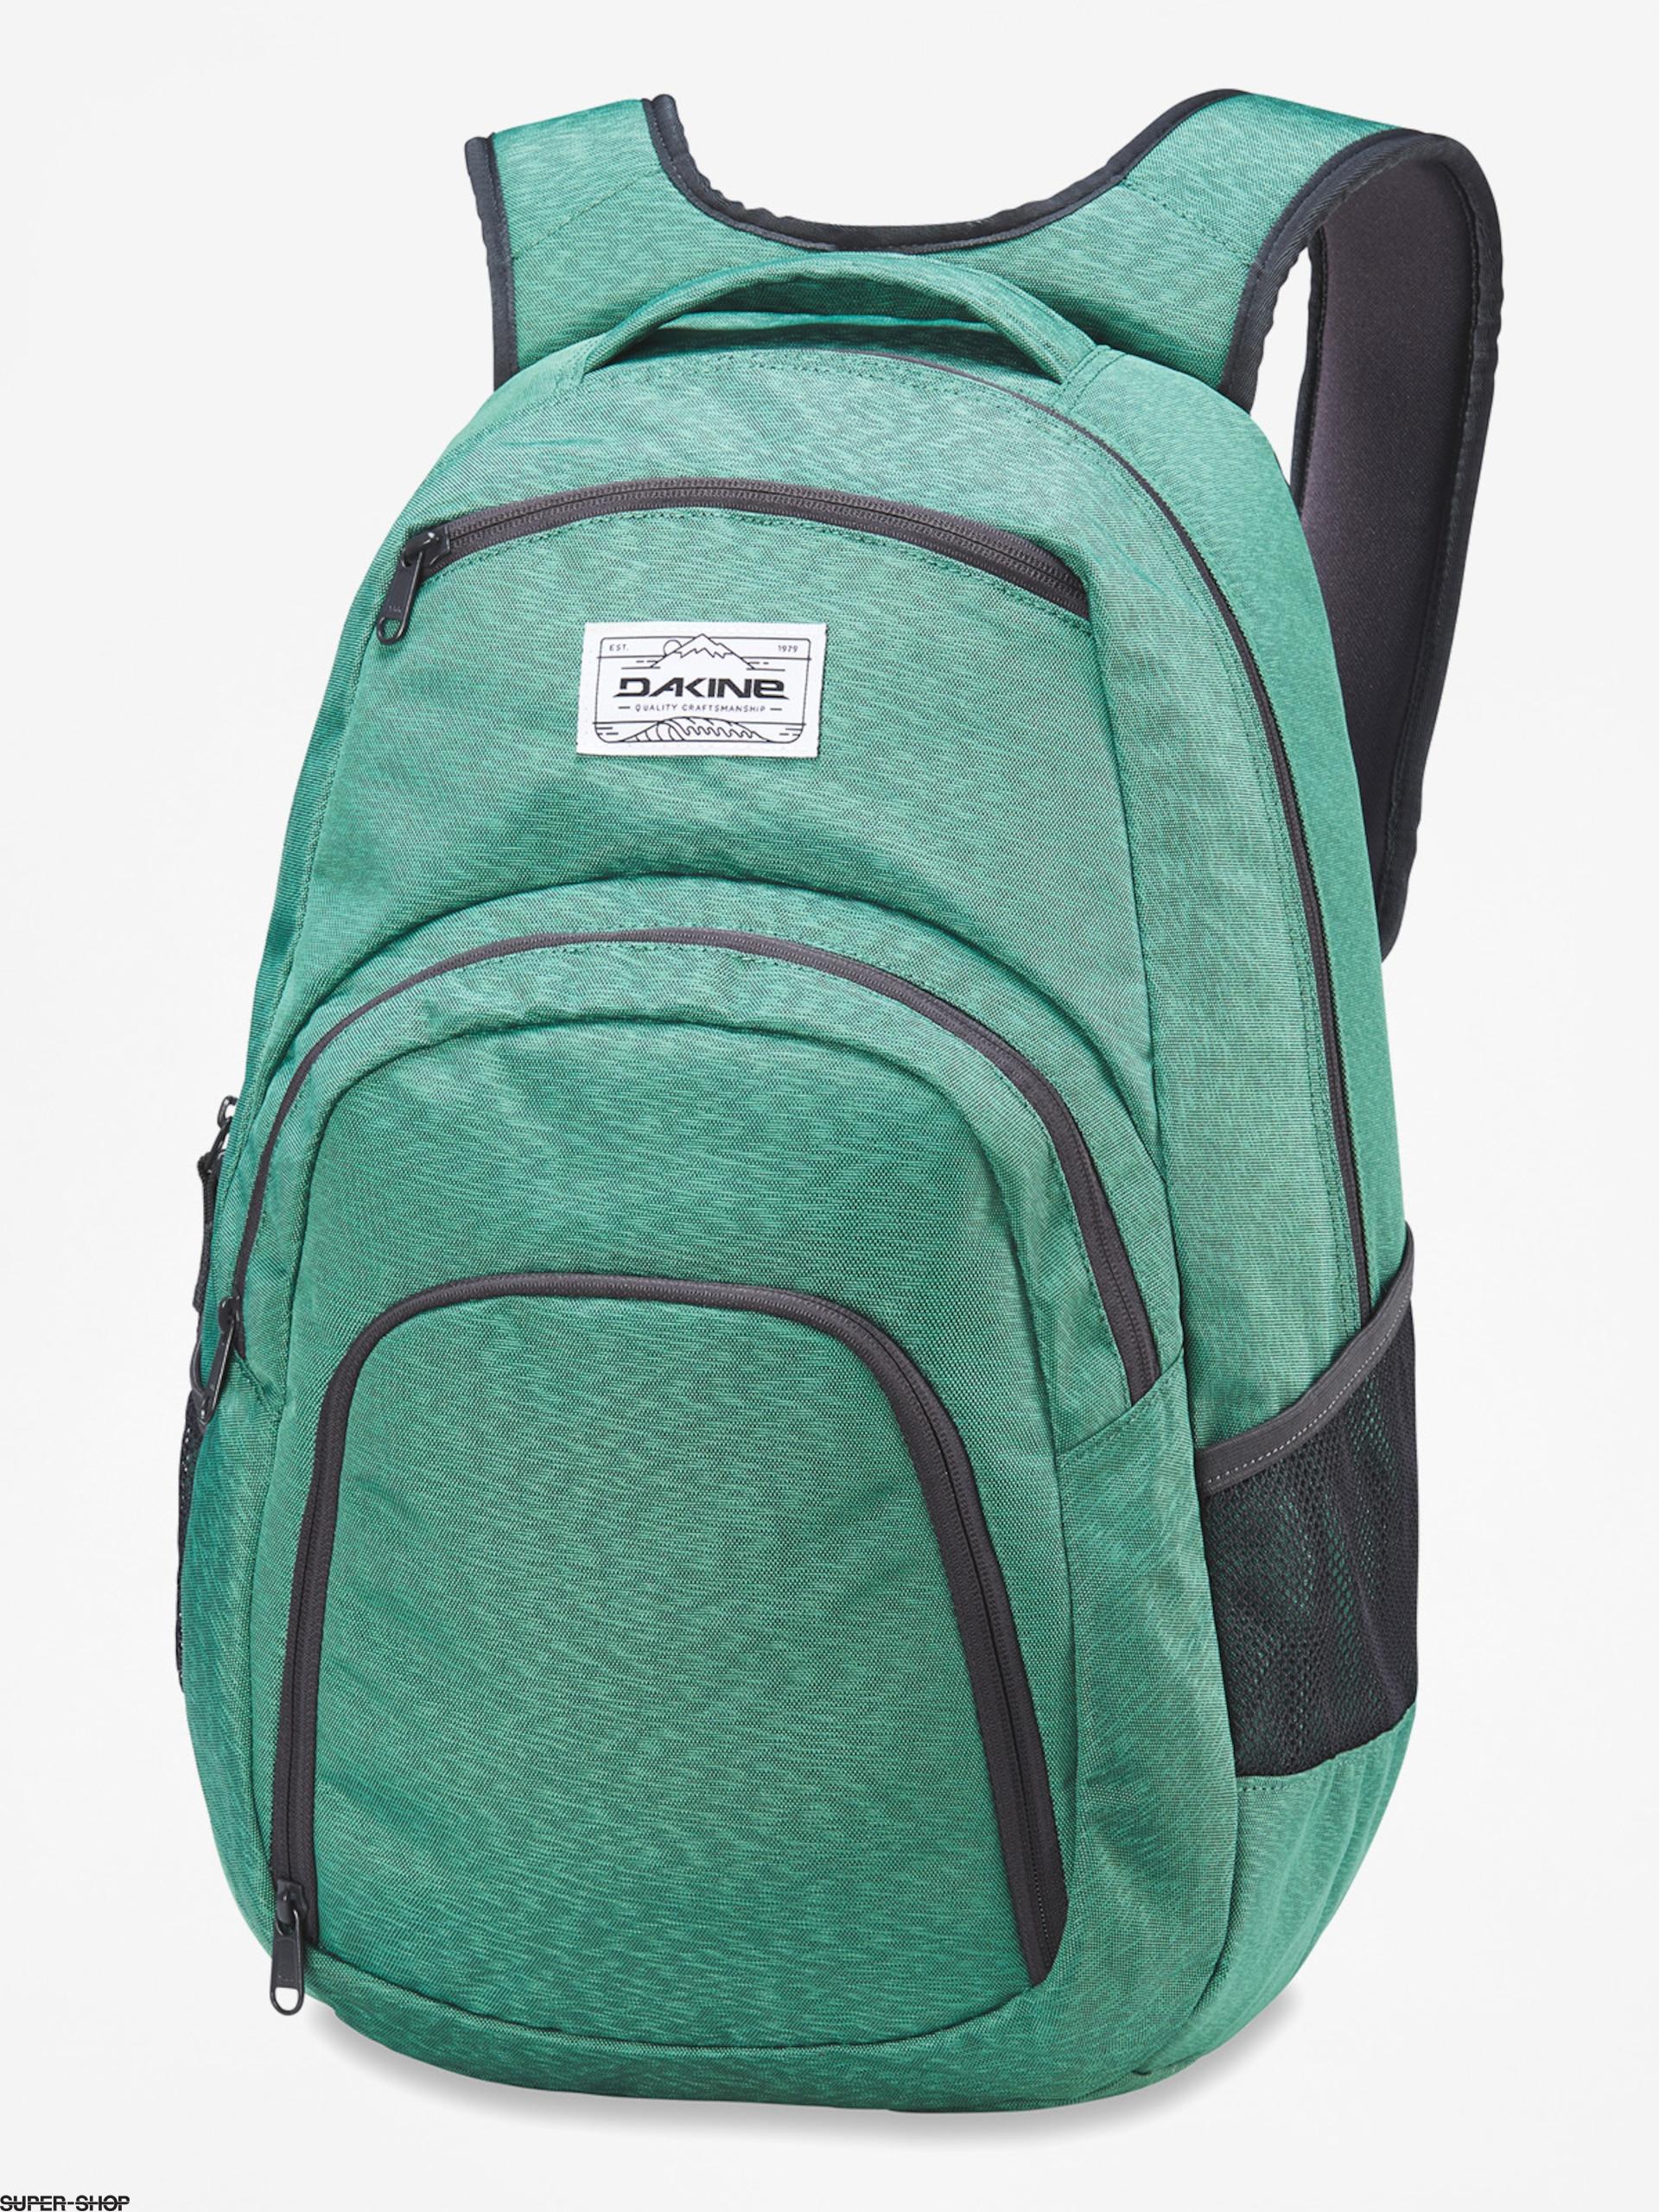 9dc9607f98c 923161-w1920-dakine-backpack-campus-33l-saltwater.jpg